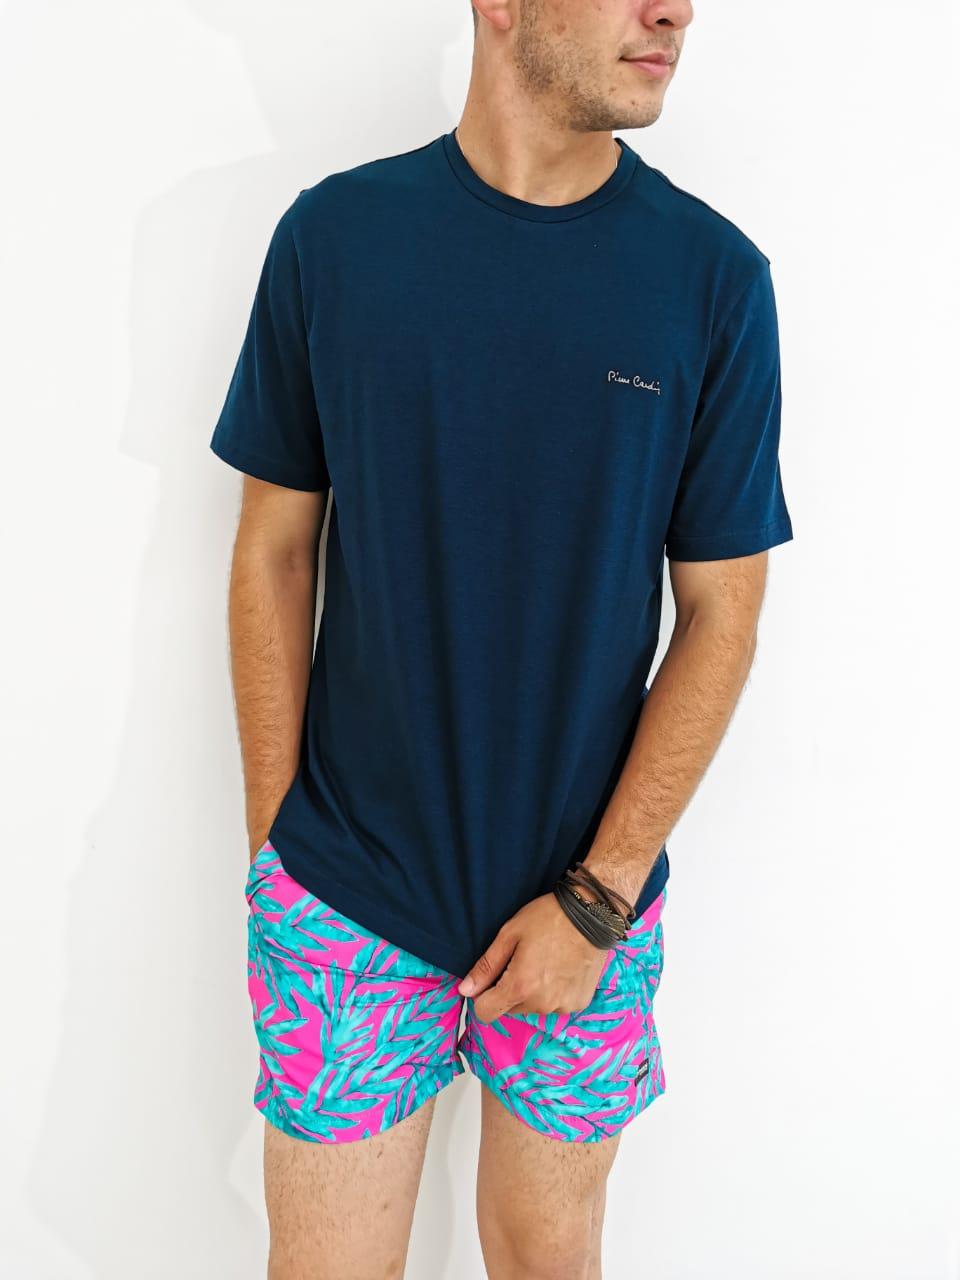 Camiseta Pierre Cardin Azul Marinho